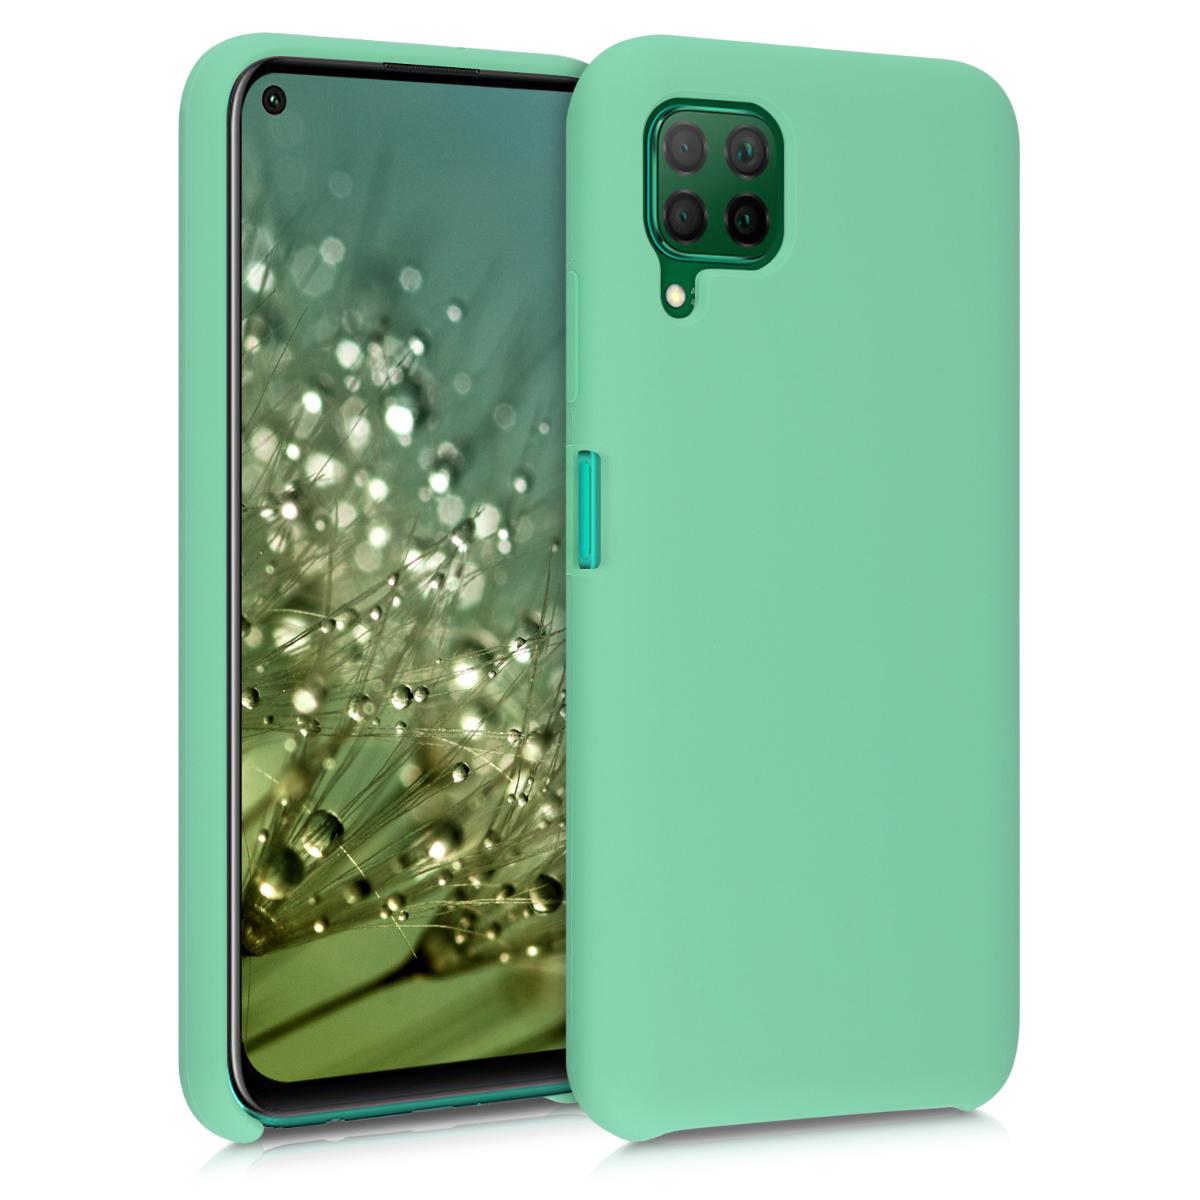 Peprmintově zelené silikonové pouzdro / obal pro Huawei P40 Lite